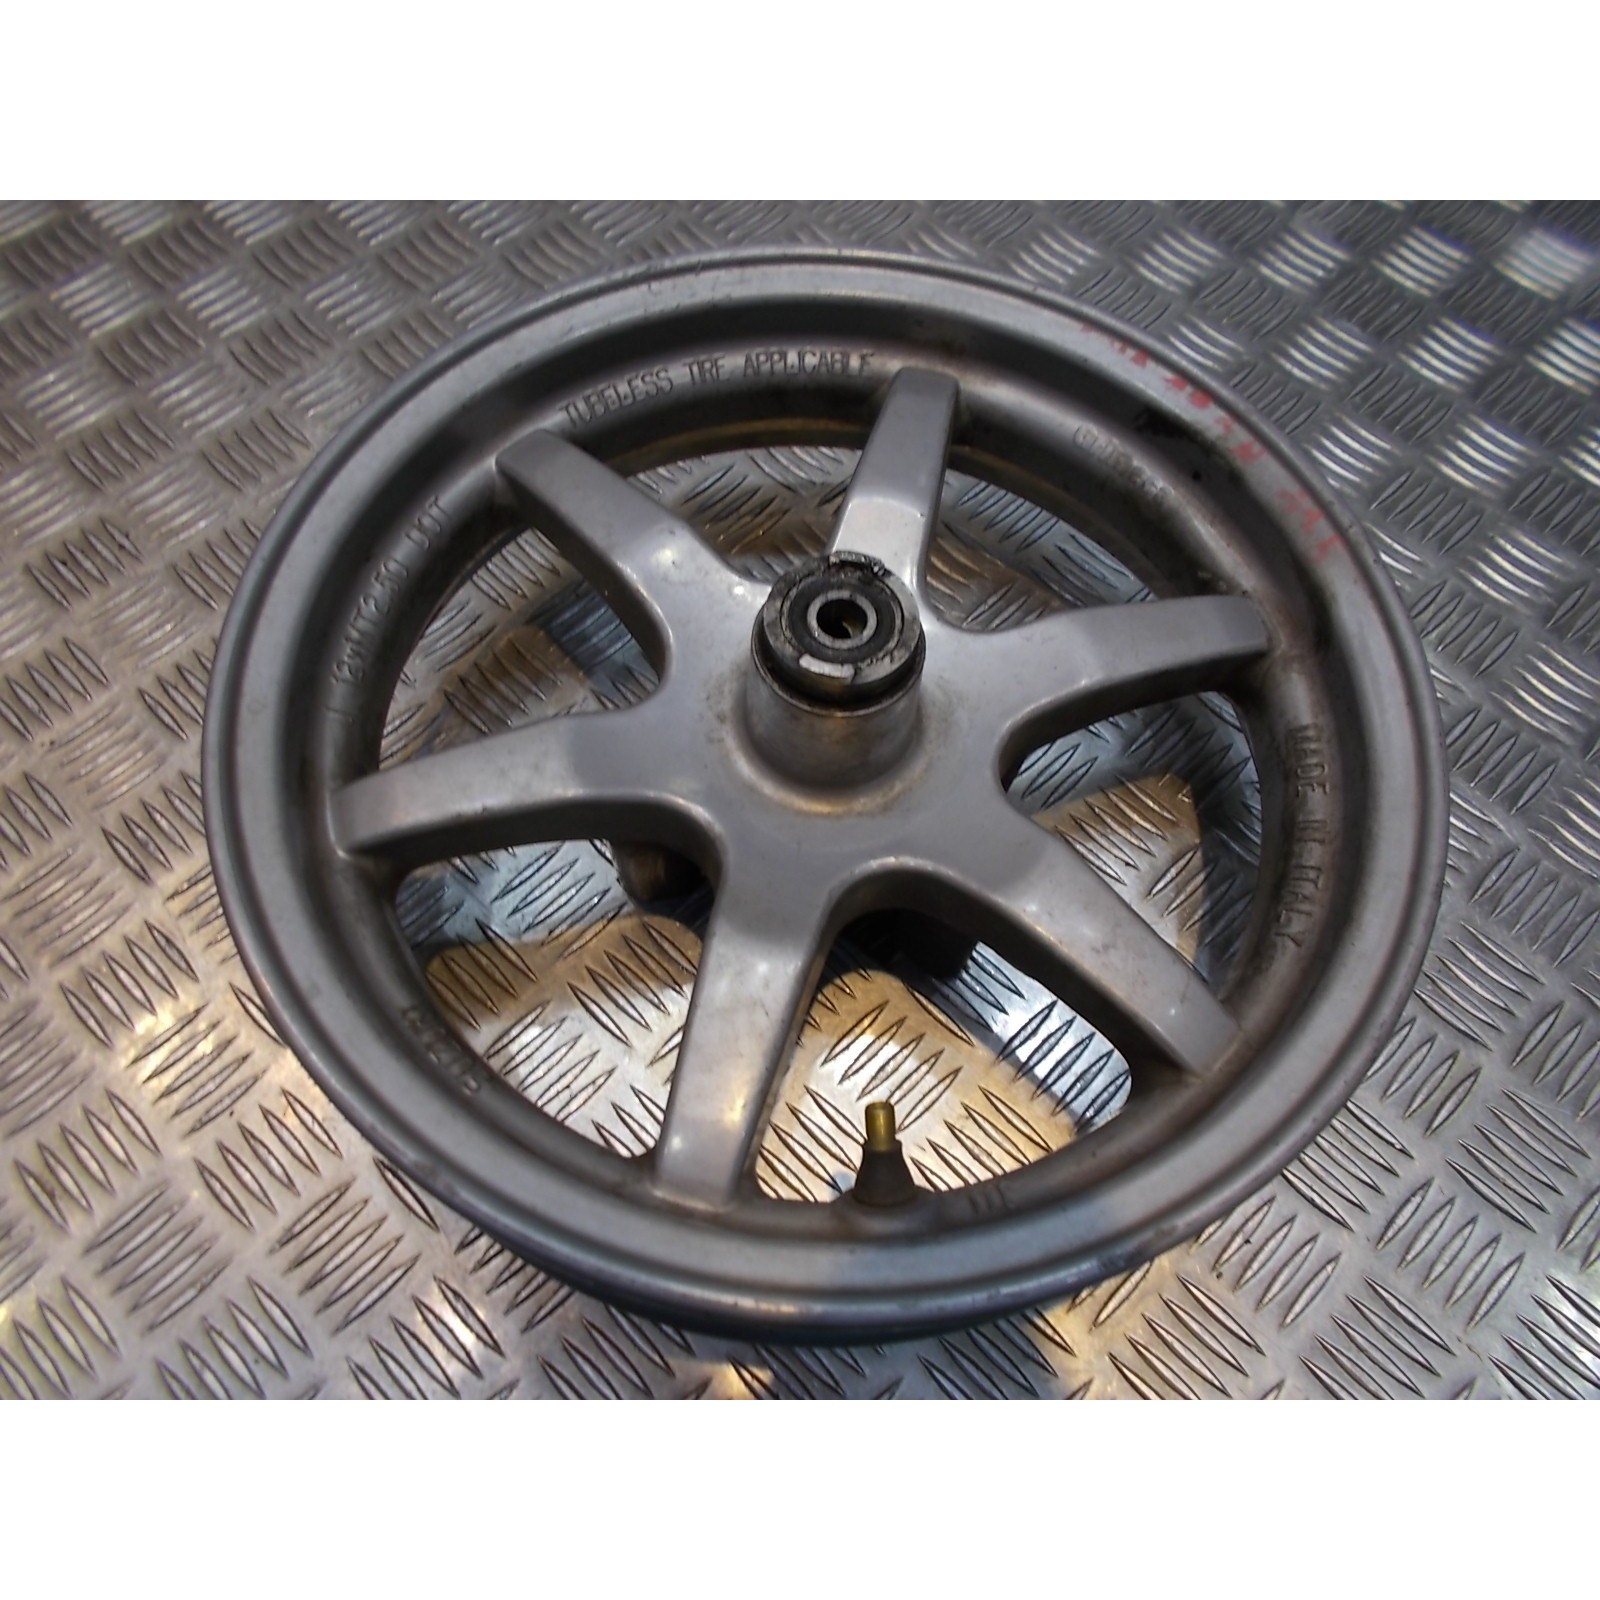 jante roue avant scooter suzuki uh 125 burgman bp111 2002 - 06